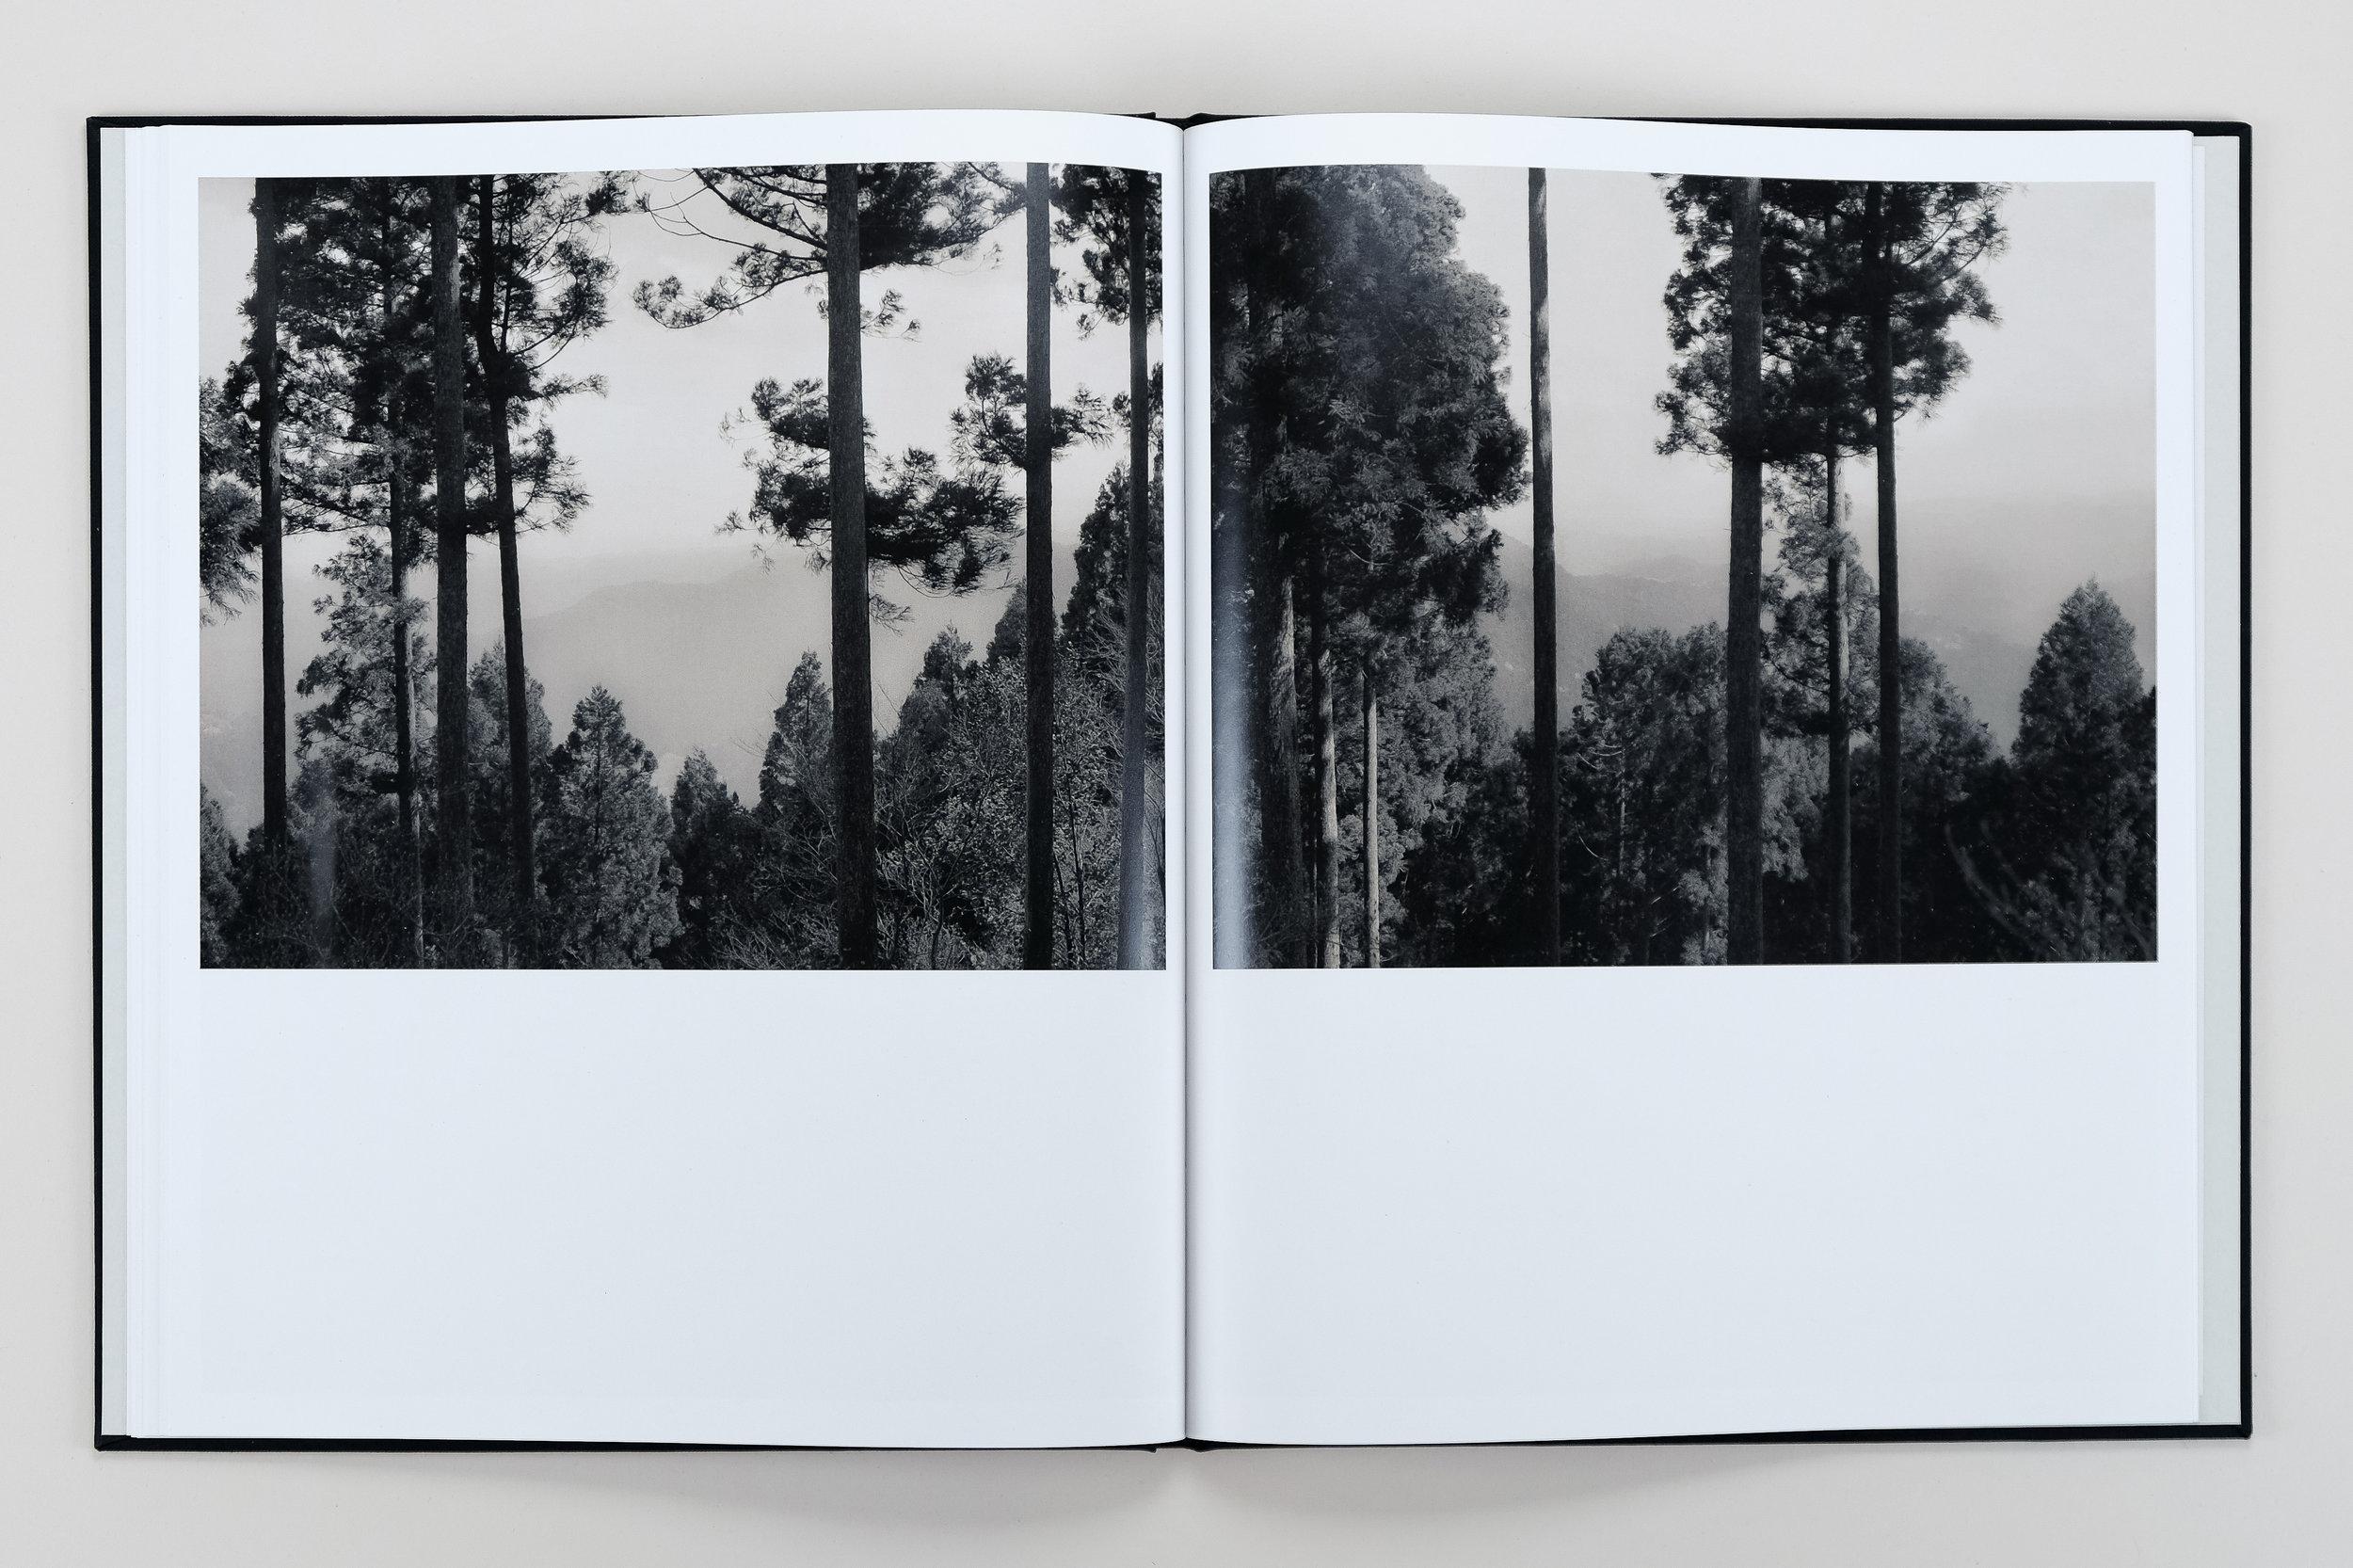 Yuka & the Forest by Lena C. Emery